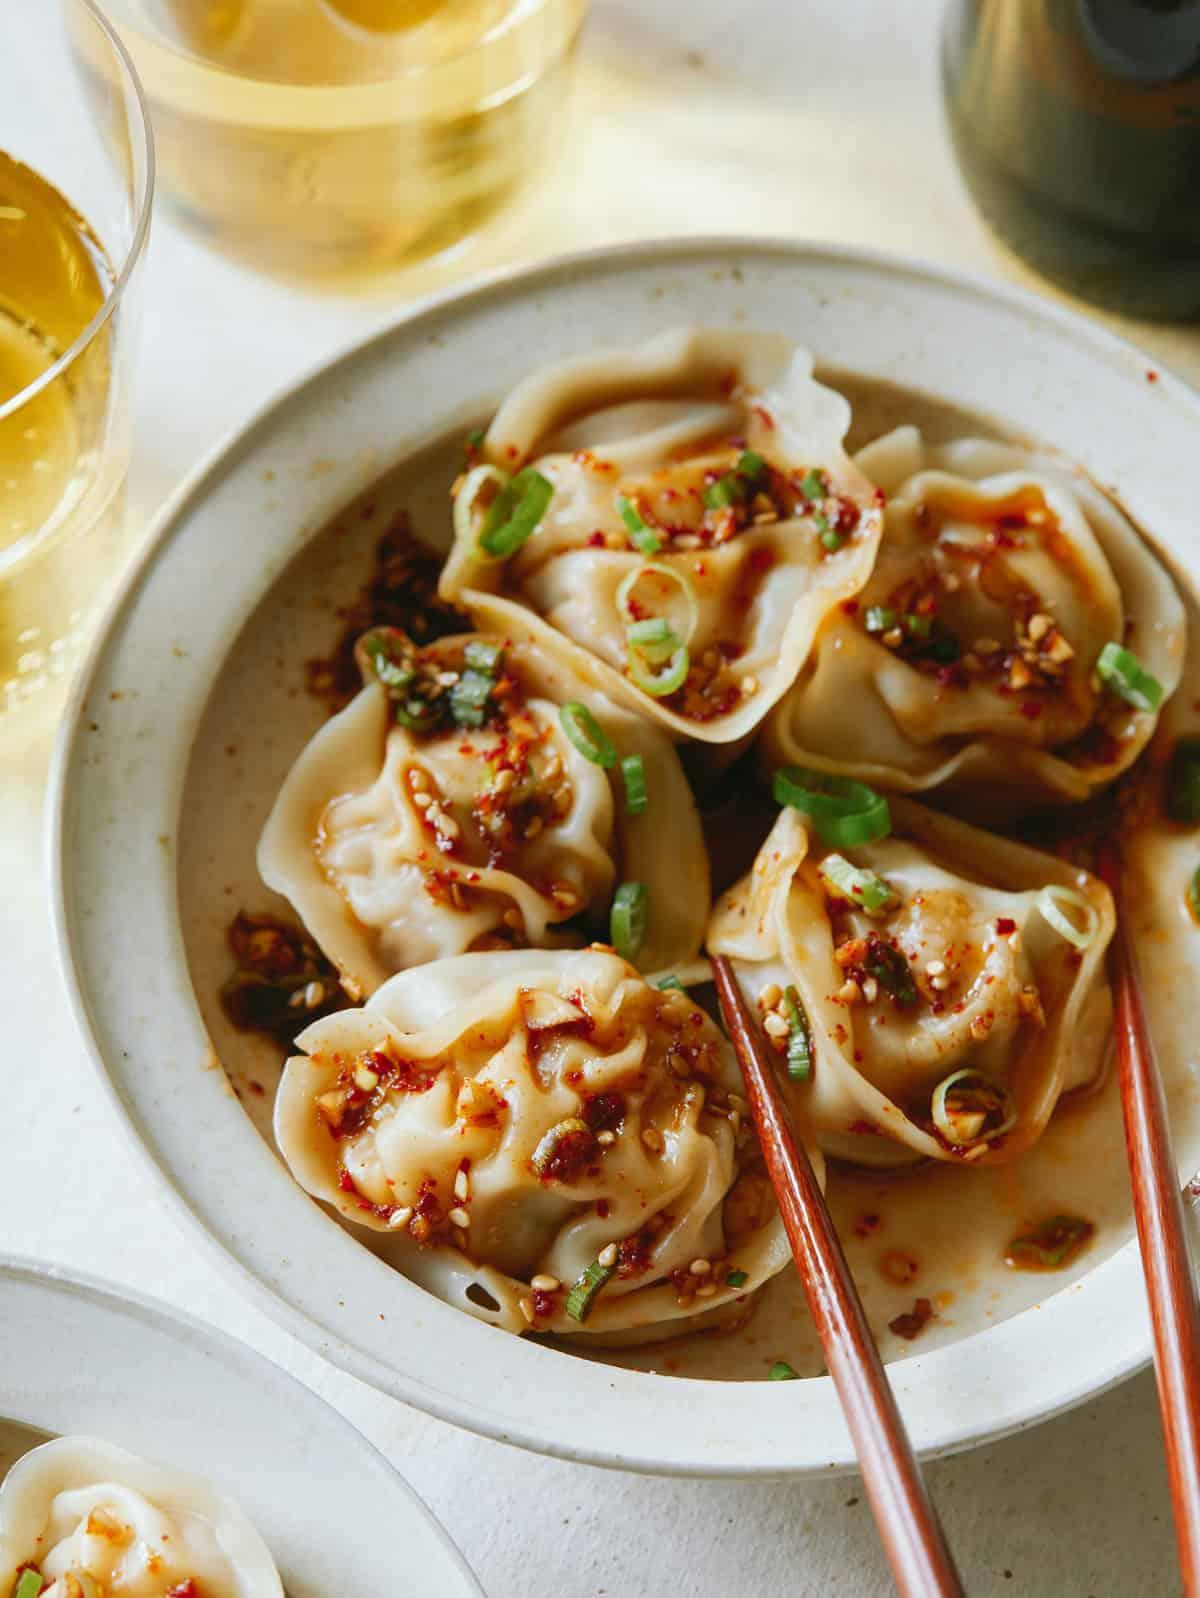 Pork and shrimp dumplings with beer on the side.